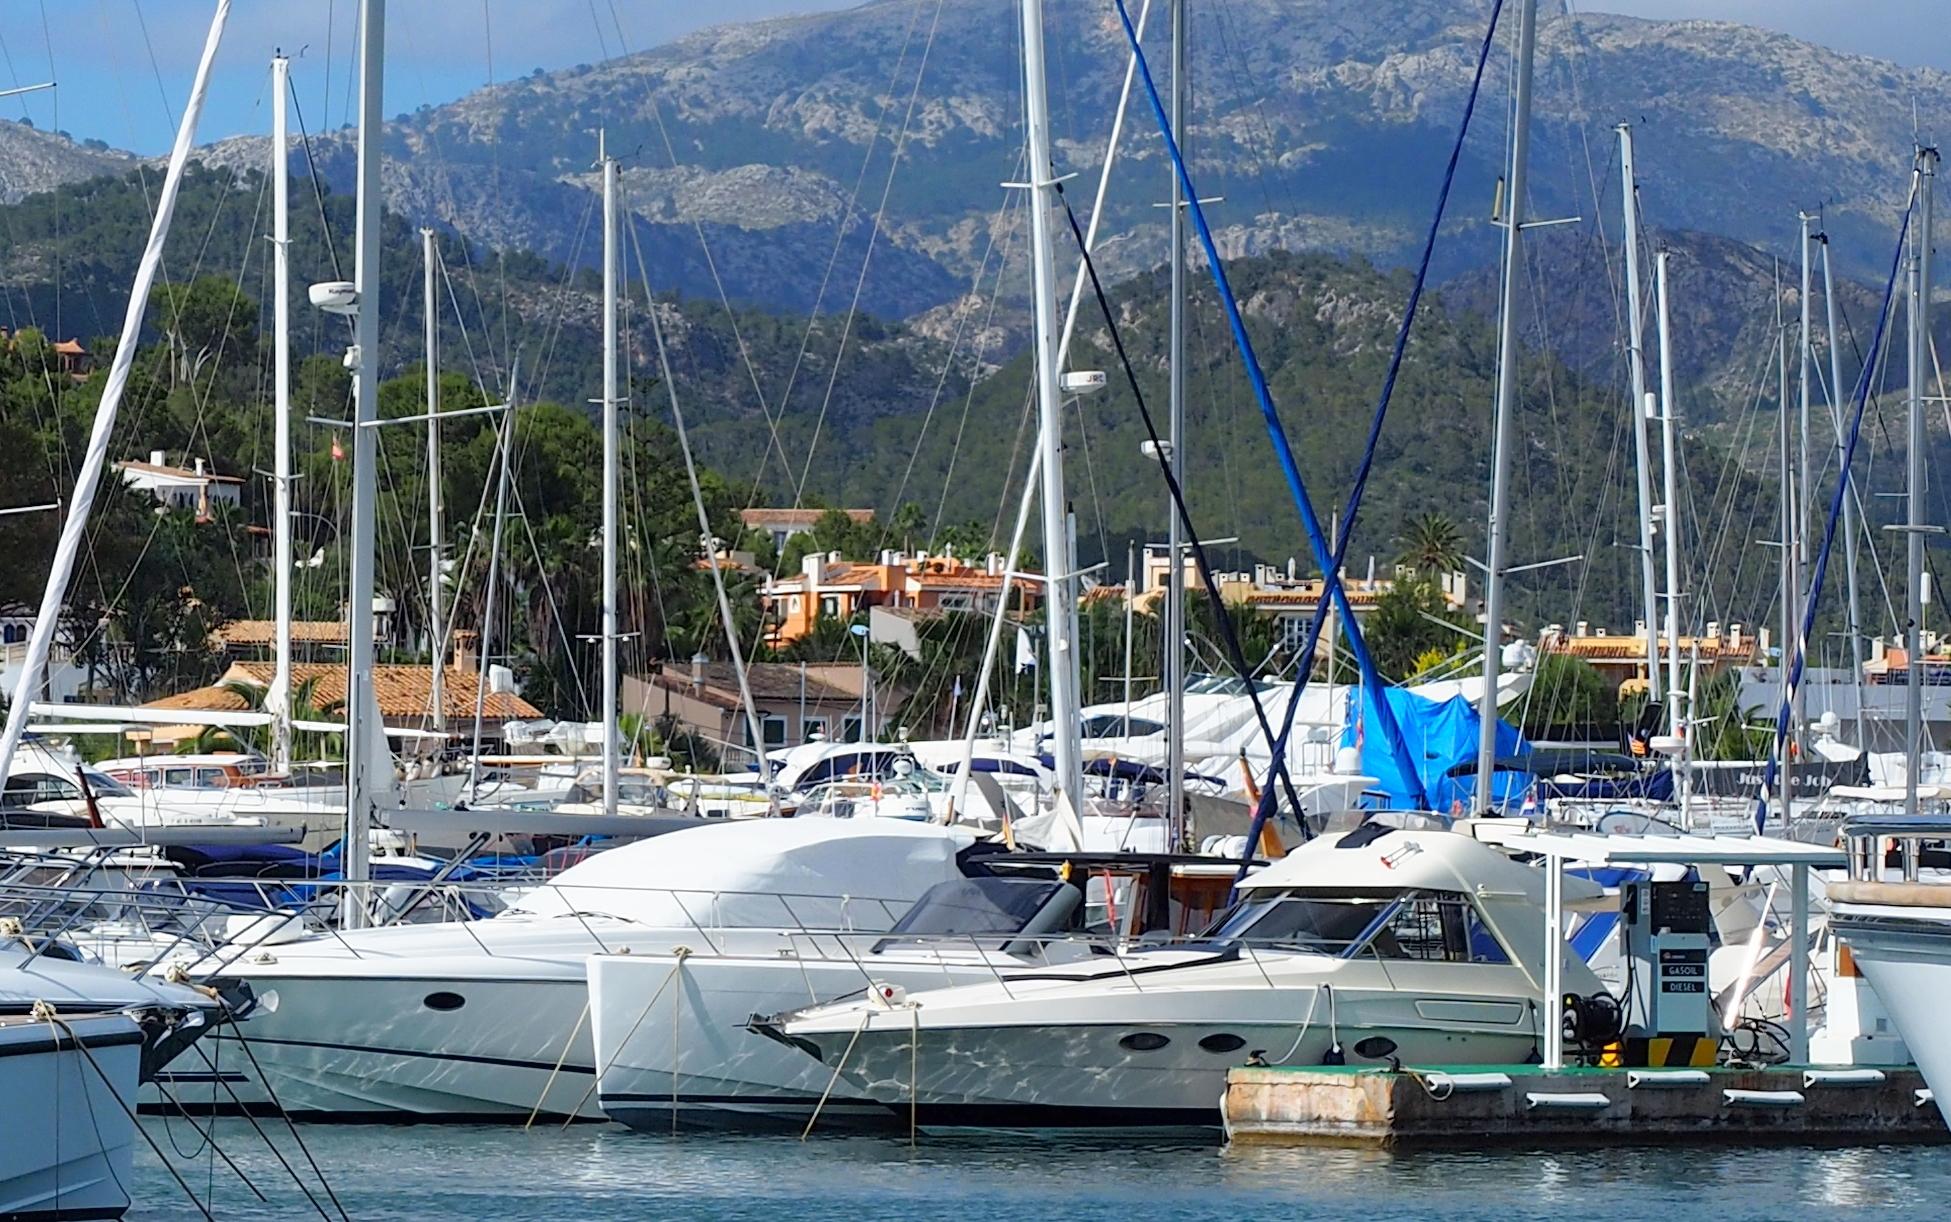 Mariner Boating Holidays - squeezing into the marina.